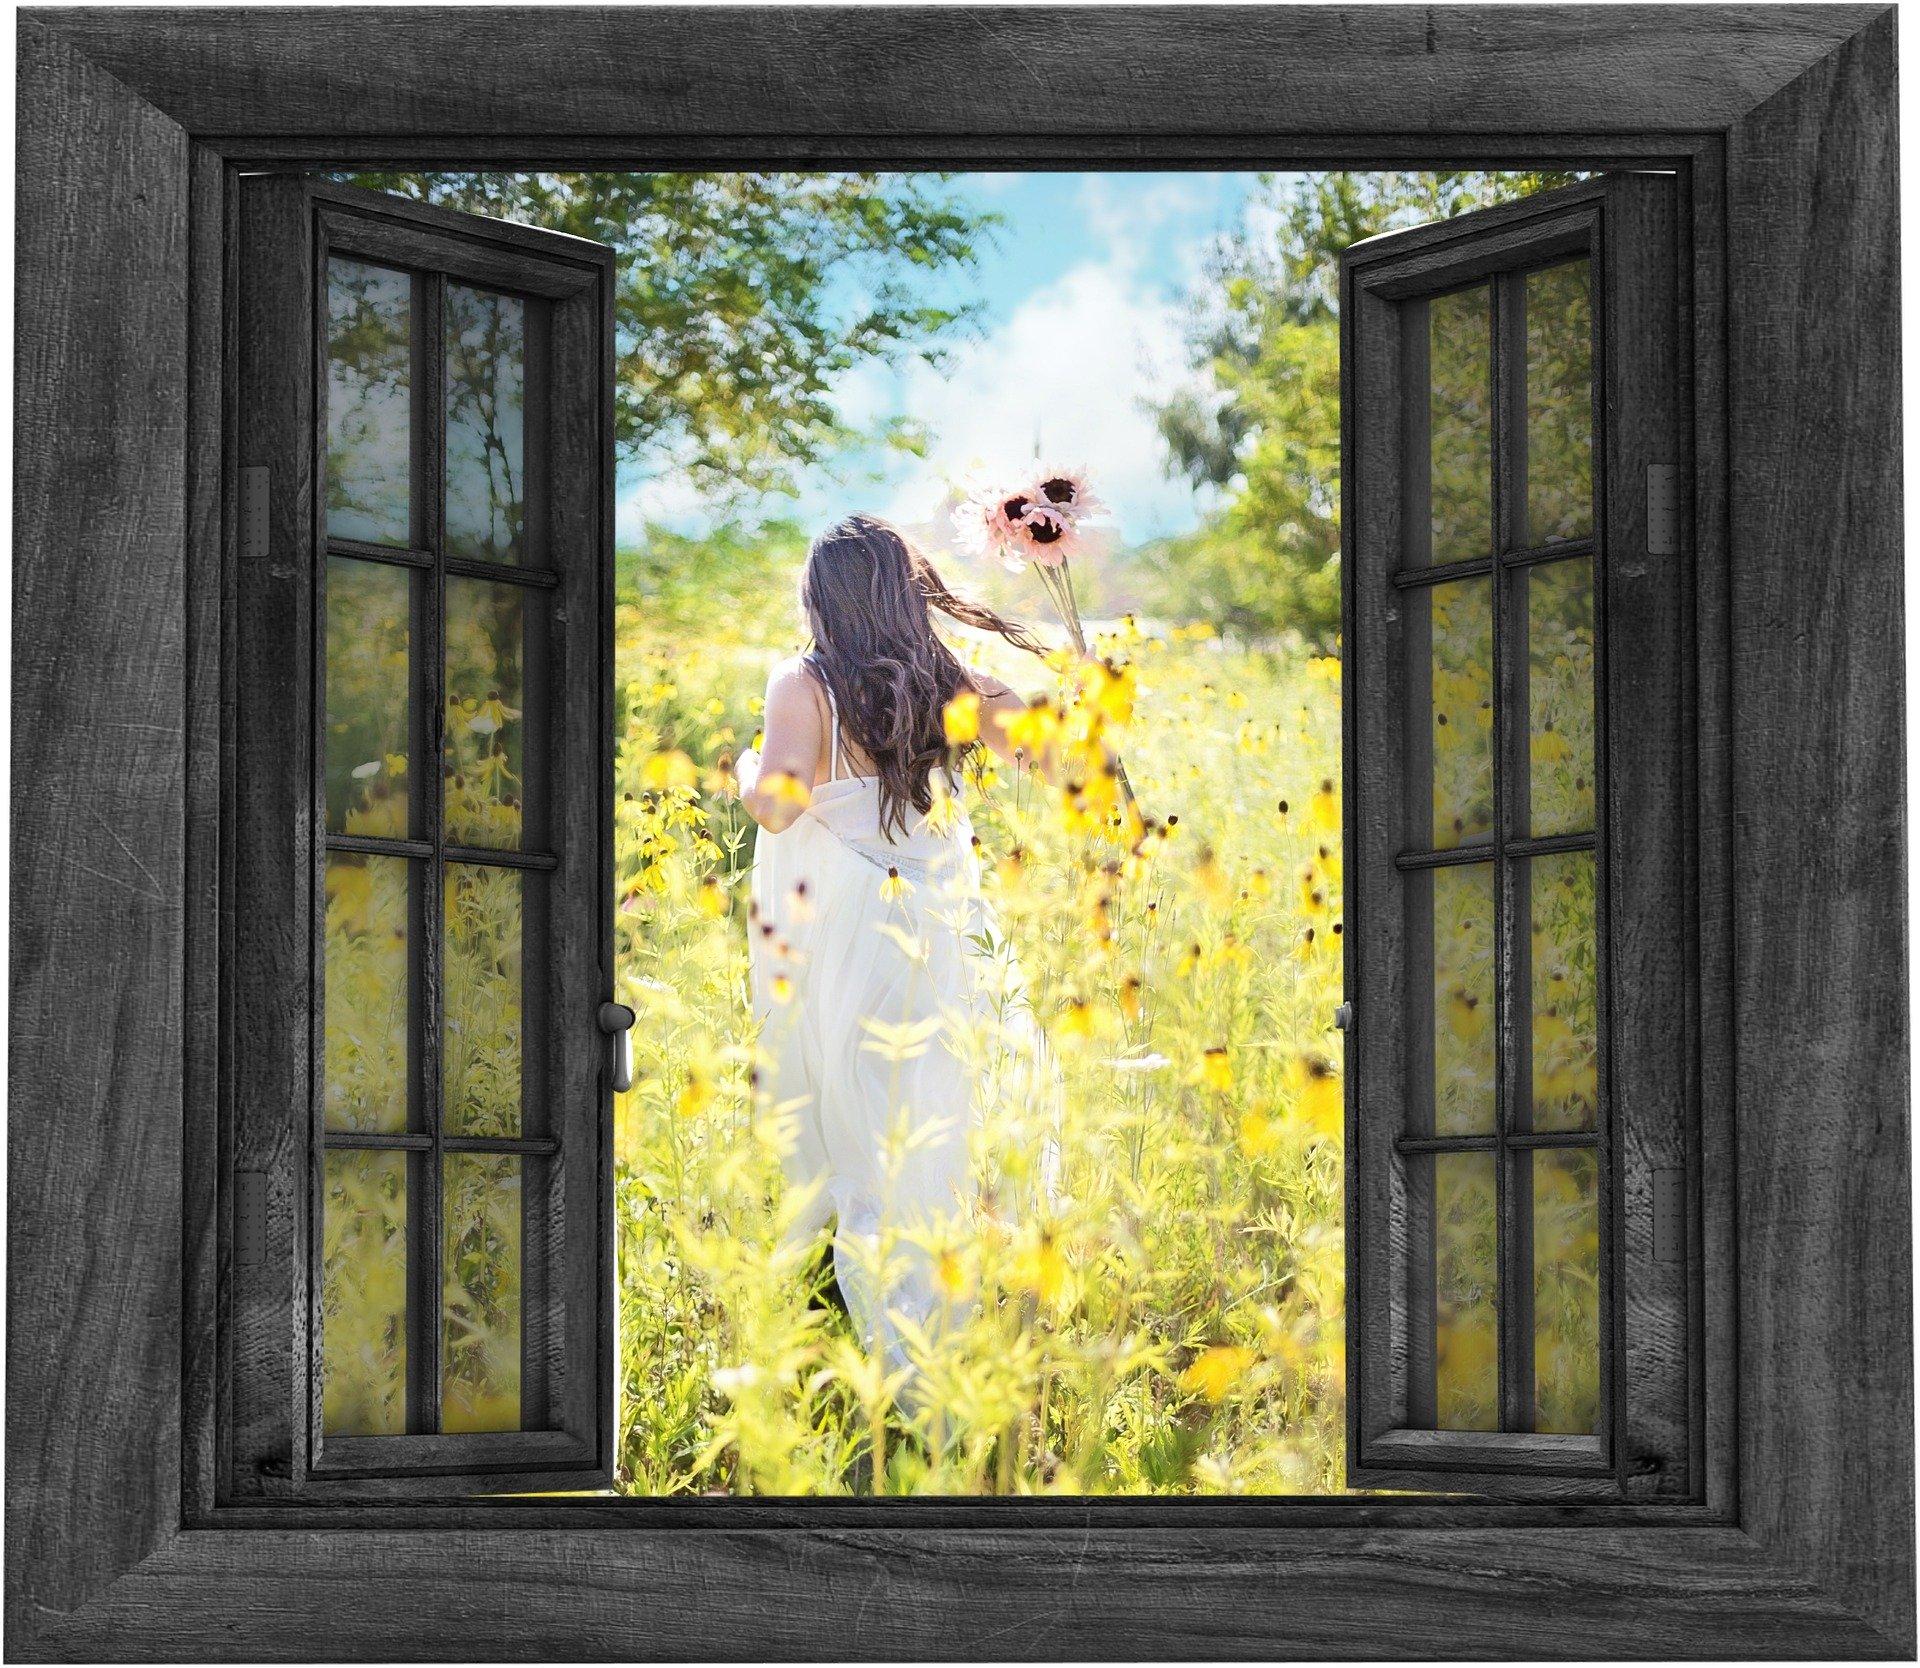 1-girl-fenêtre-nature